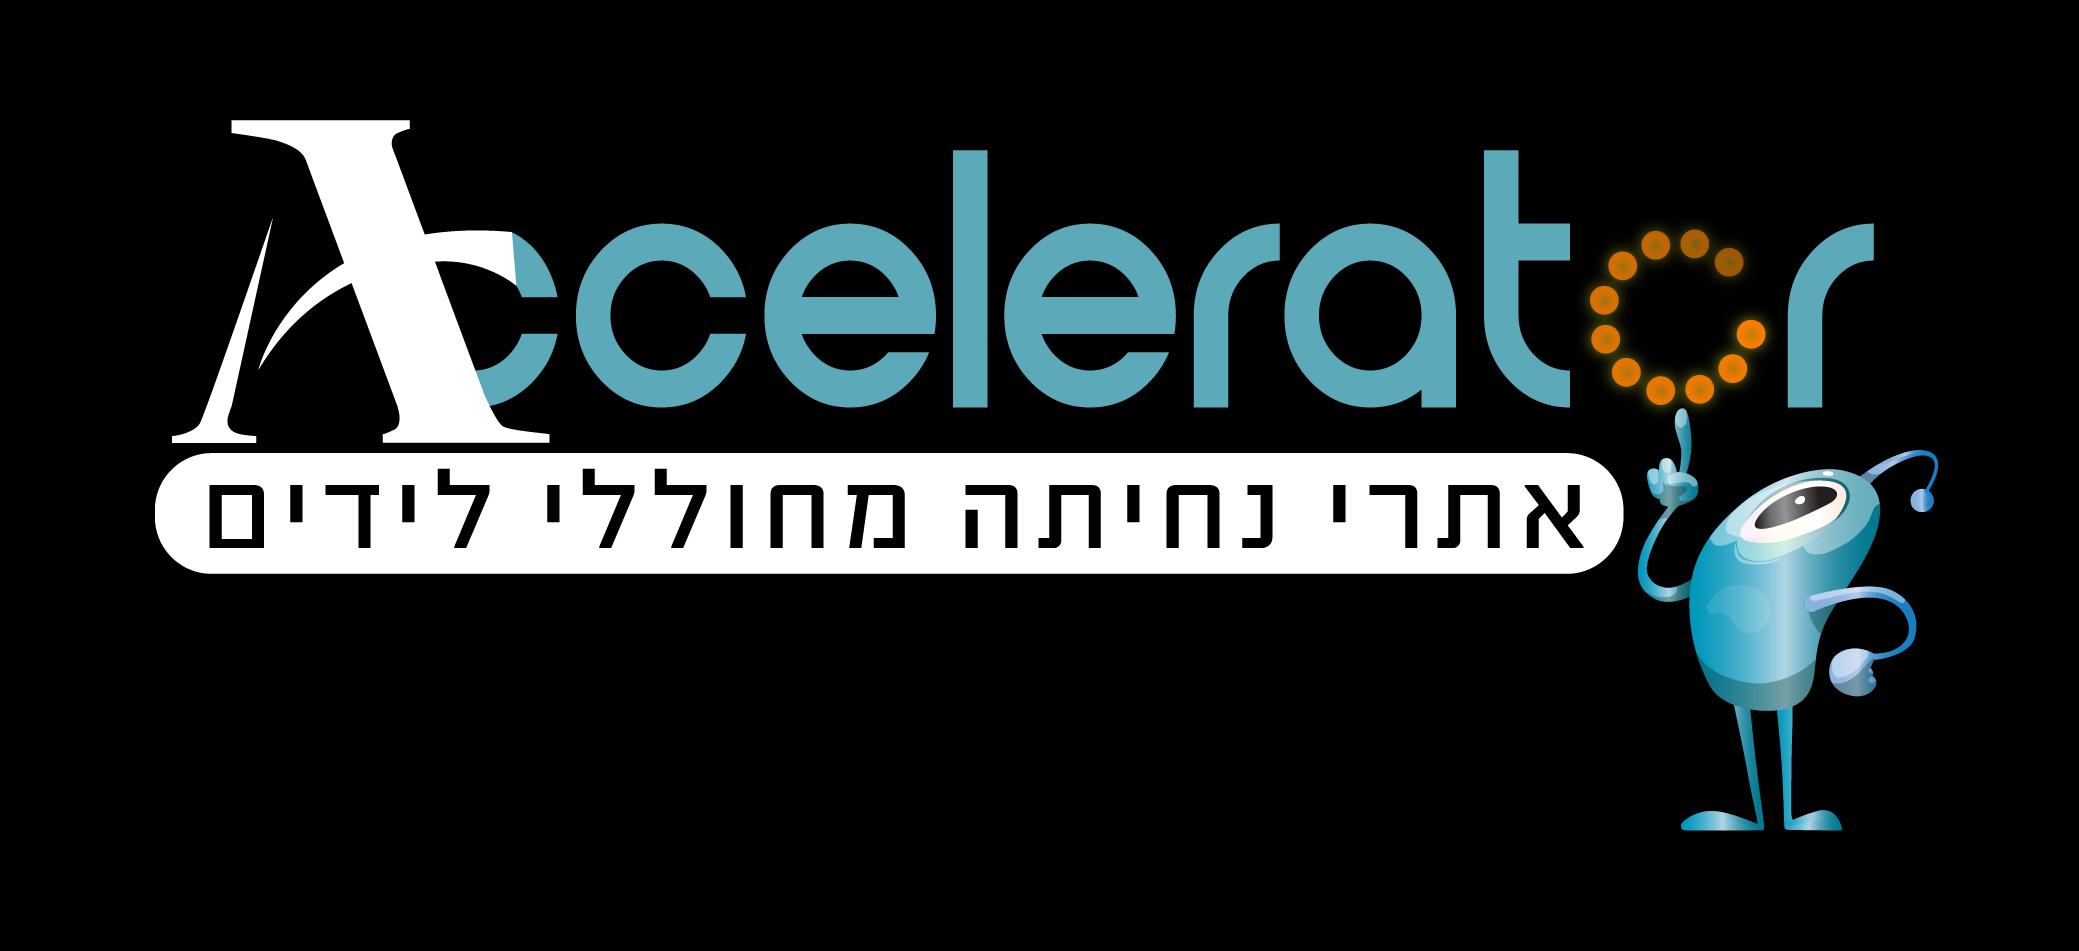 Accelorator_Logo_Black